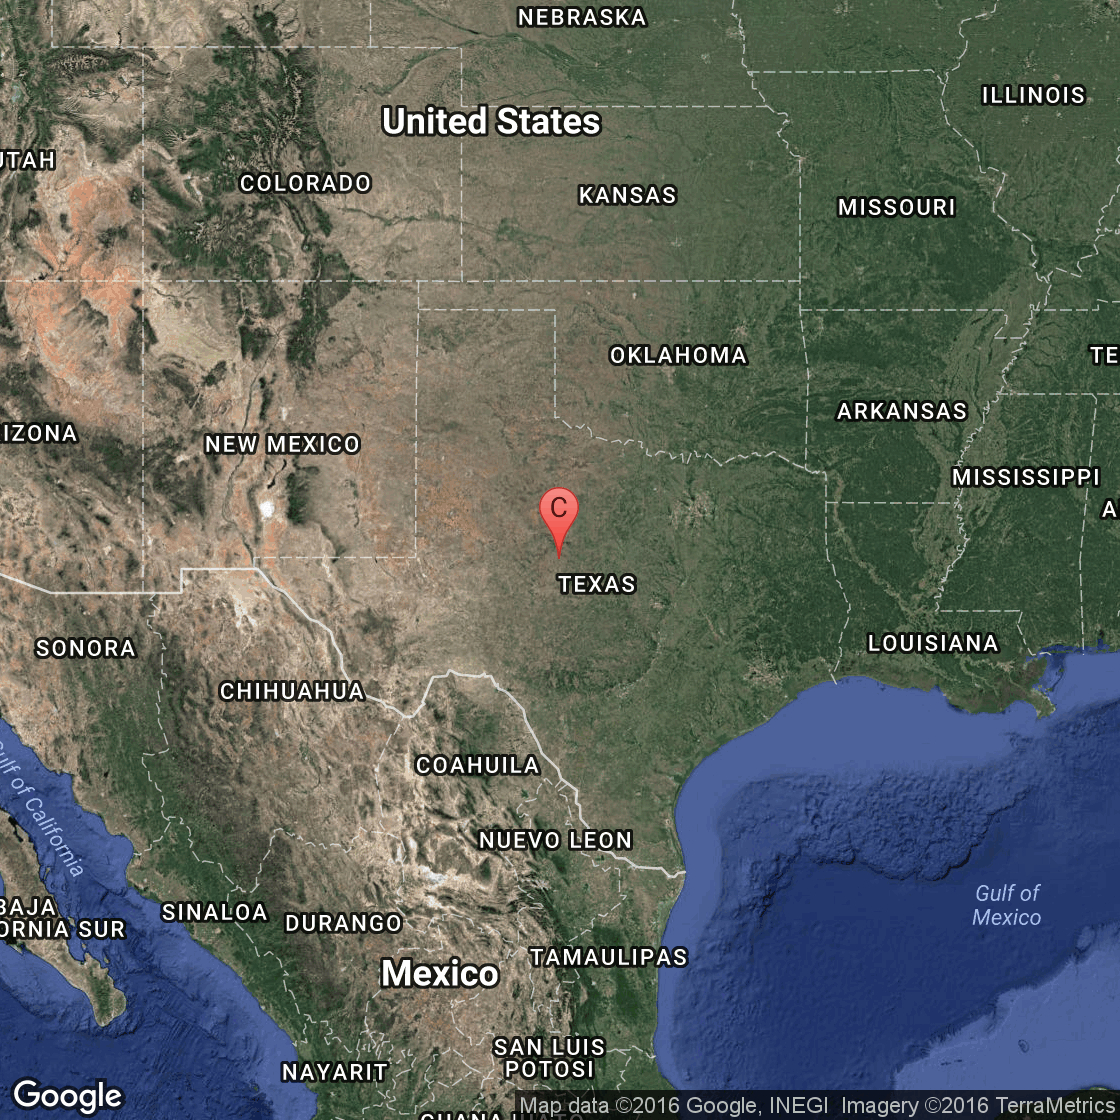 Fishing Lakes Near Stephenville, Texas | Usa Today - Texas Fishing Hot Spots Maps